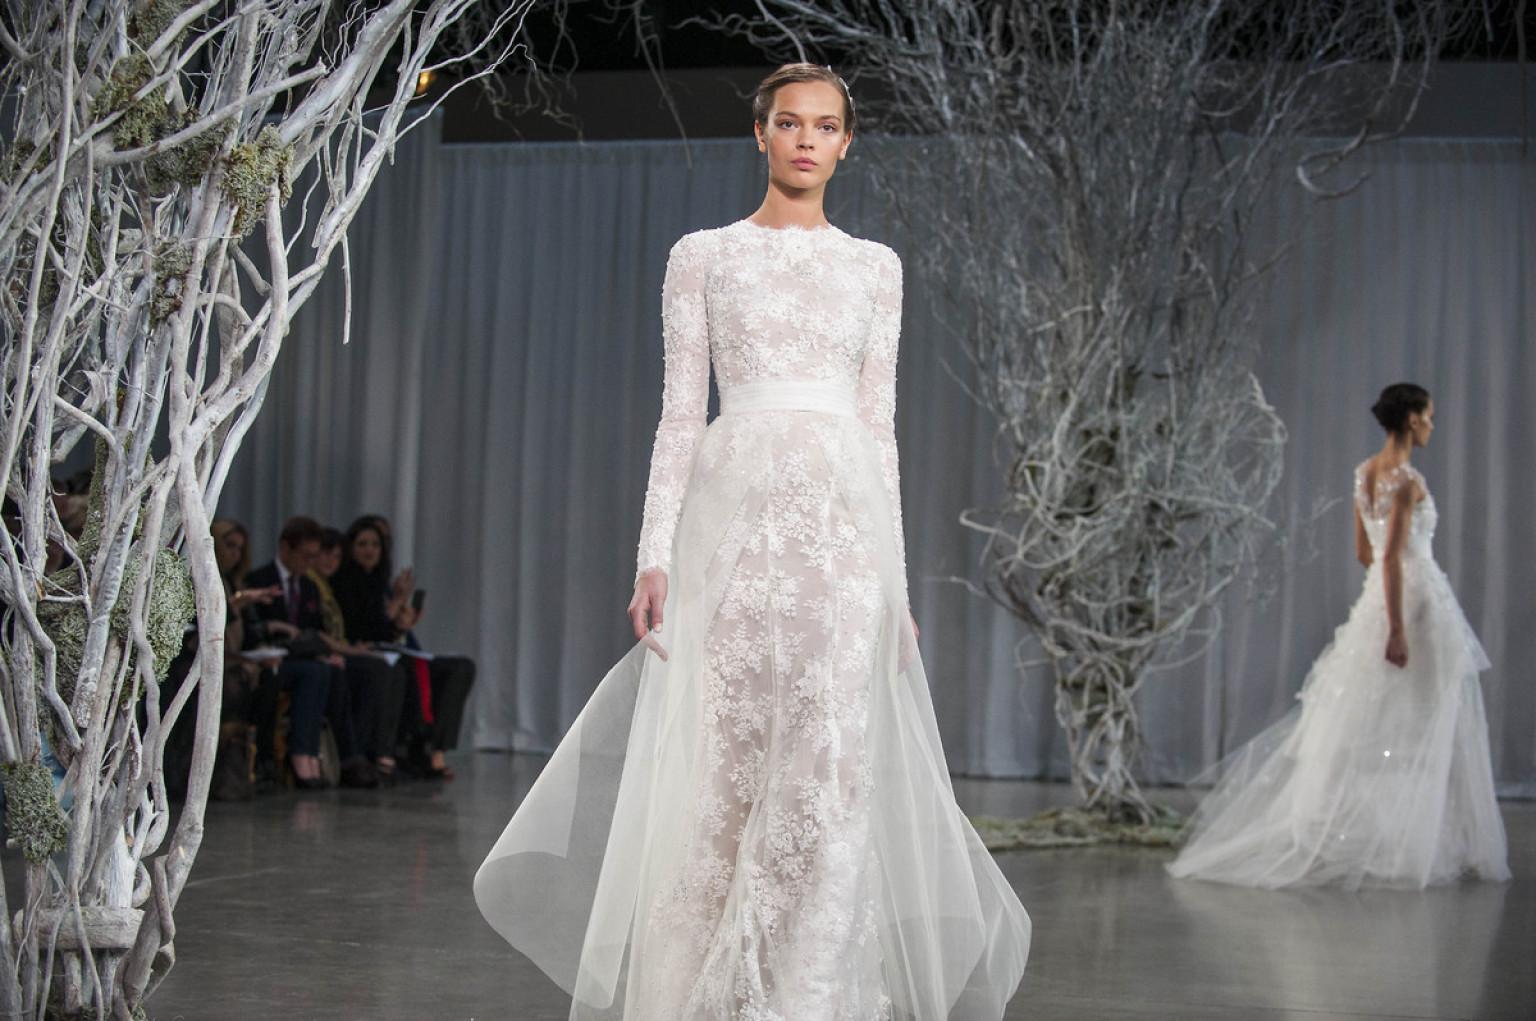 Wedding Dress Trends For 2013 Revealed By Randy Fenoli Of